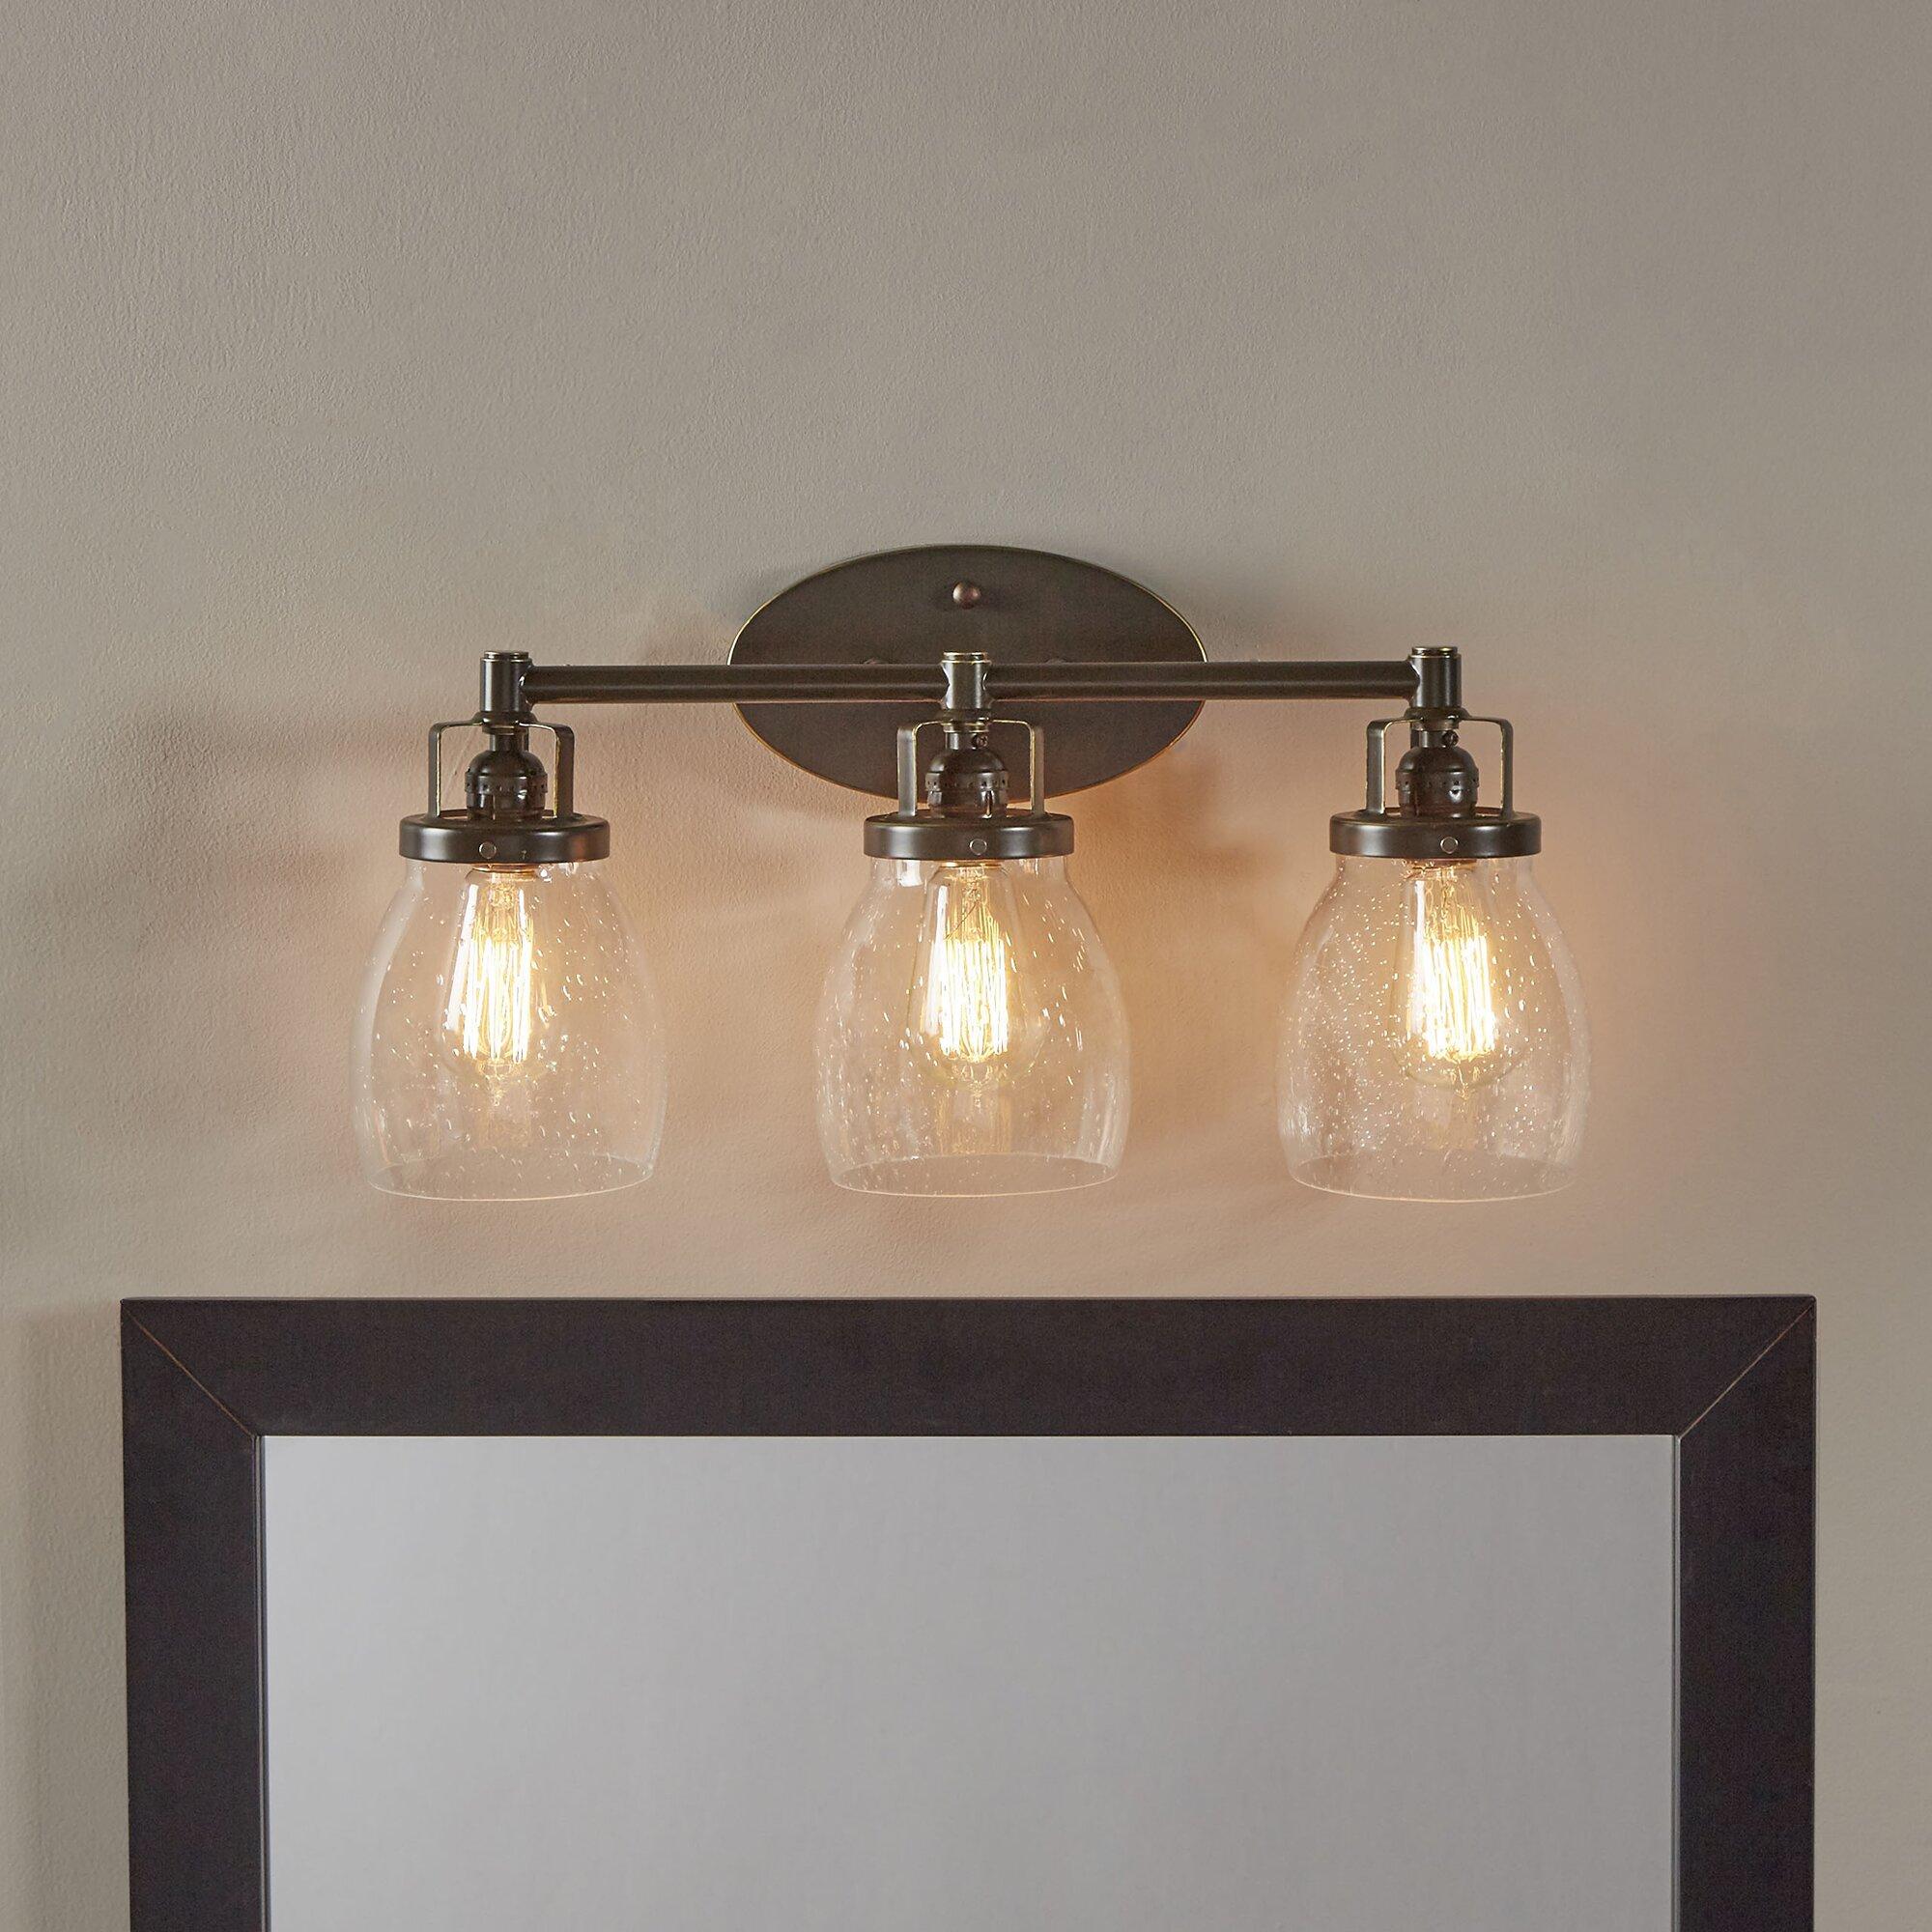 Yesler Heirloom Bronze 3-Light Vanity Light & Reviews Birch Lane